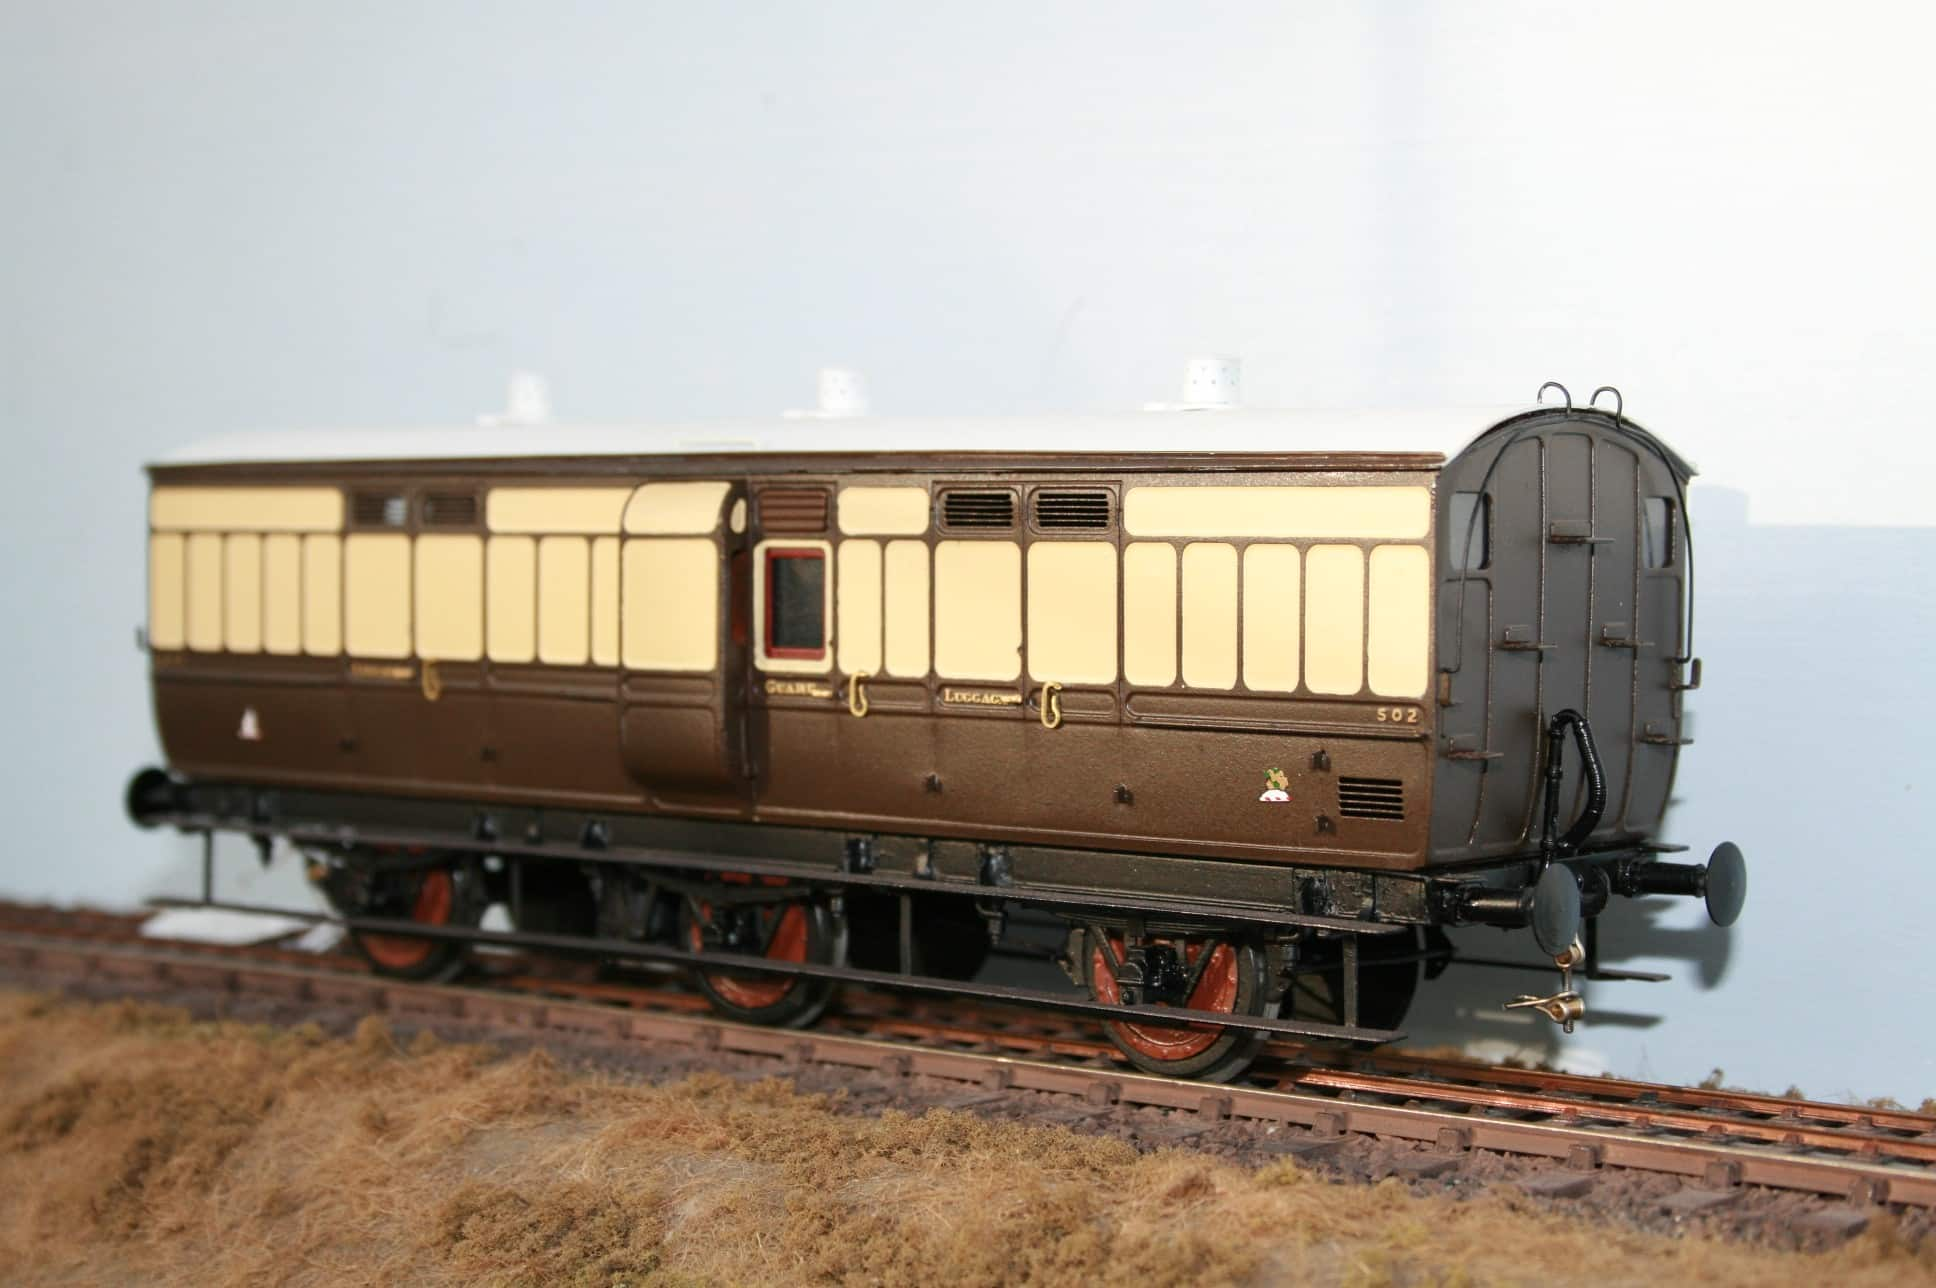 GWR 6 wheel Passenger Luggage/Guards Van r/n 502